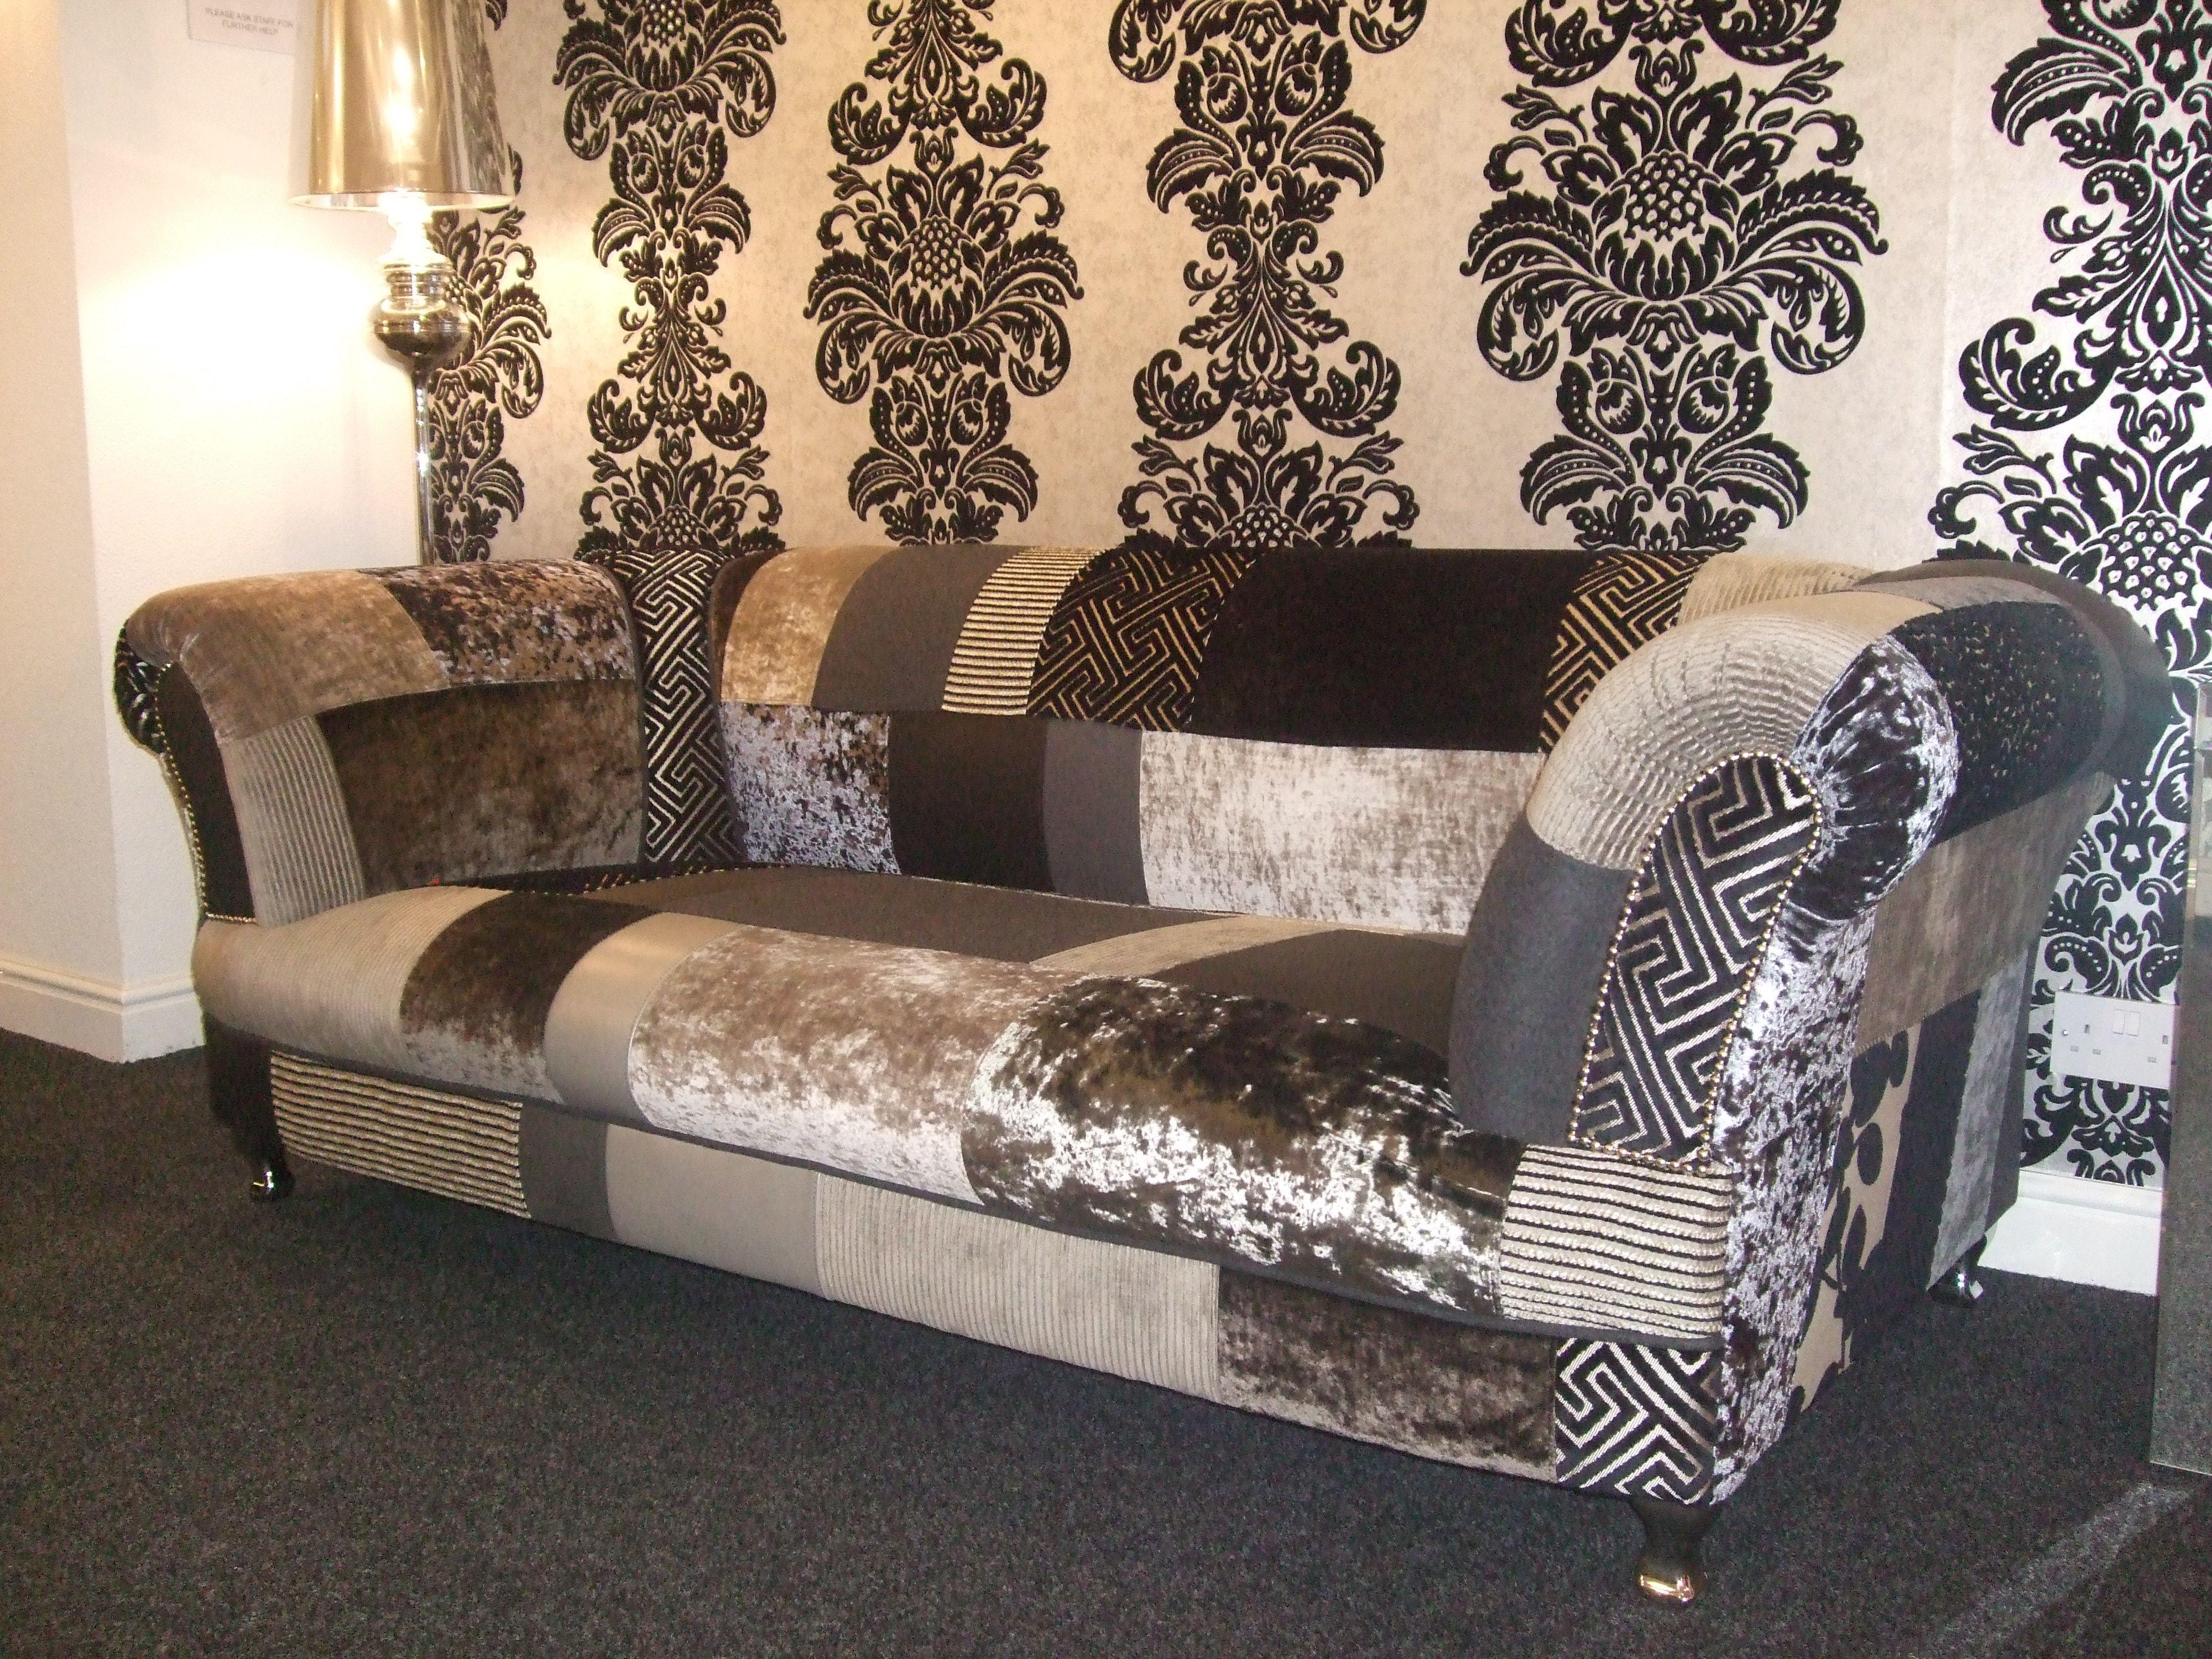 Patchwork sofas uk go your own way patchworksofauk patchwork sofas uk go your own way patchworksofauk bespokepatchworksofa handmadesofas qualitysofas parisarafo Image collections